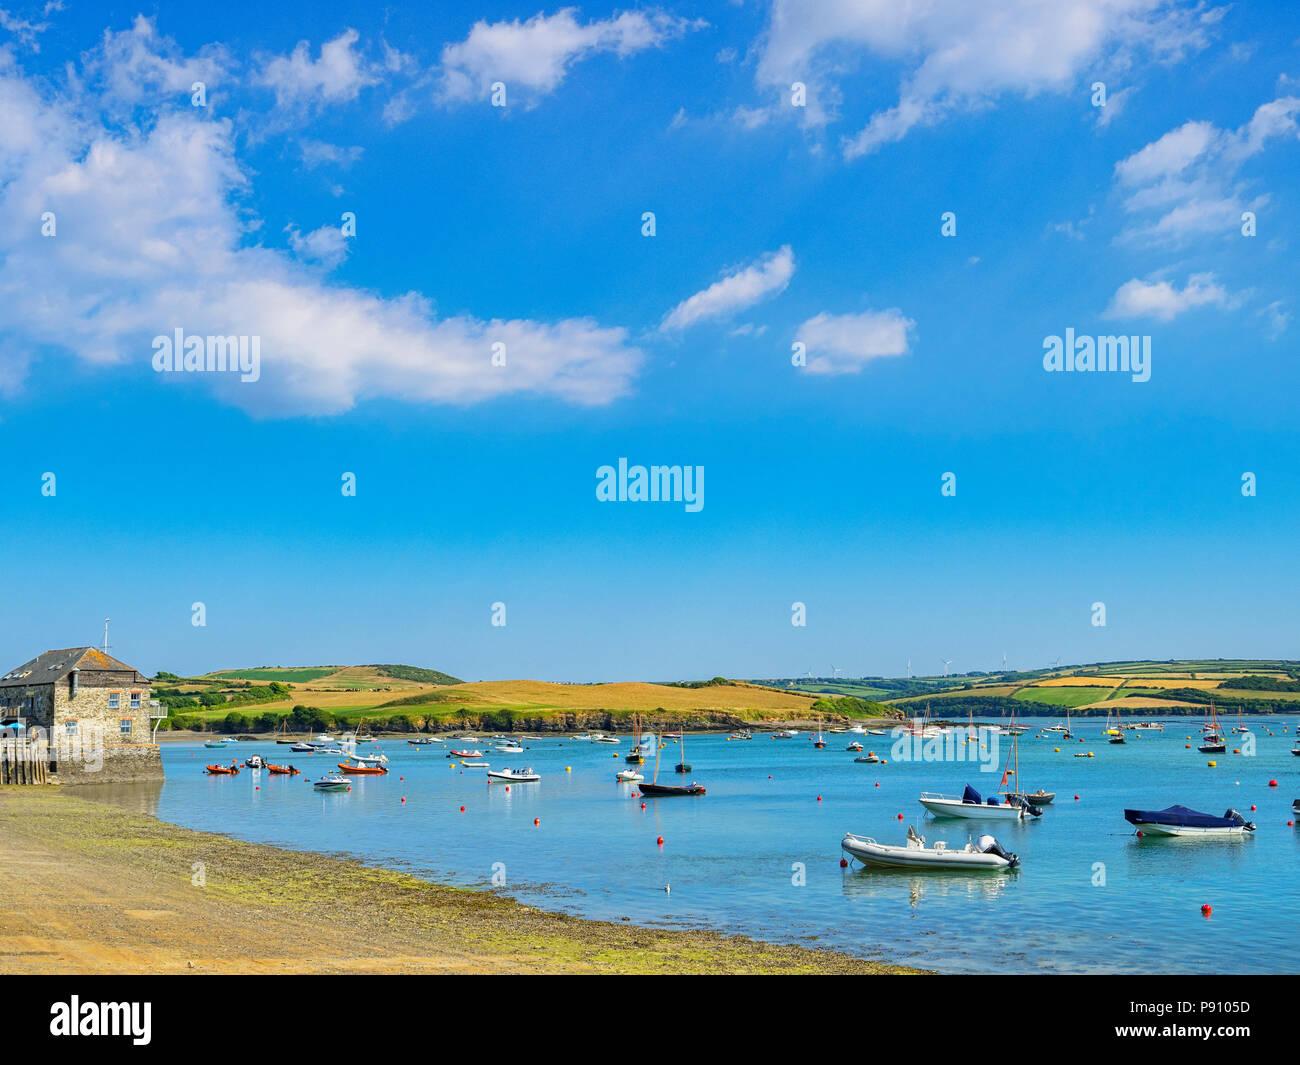 Boats on the Camel Estuary at Rock, Cornwall, UK Stock Photo